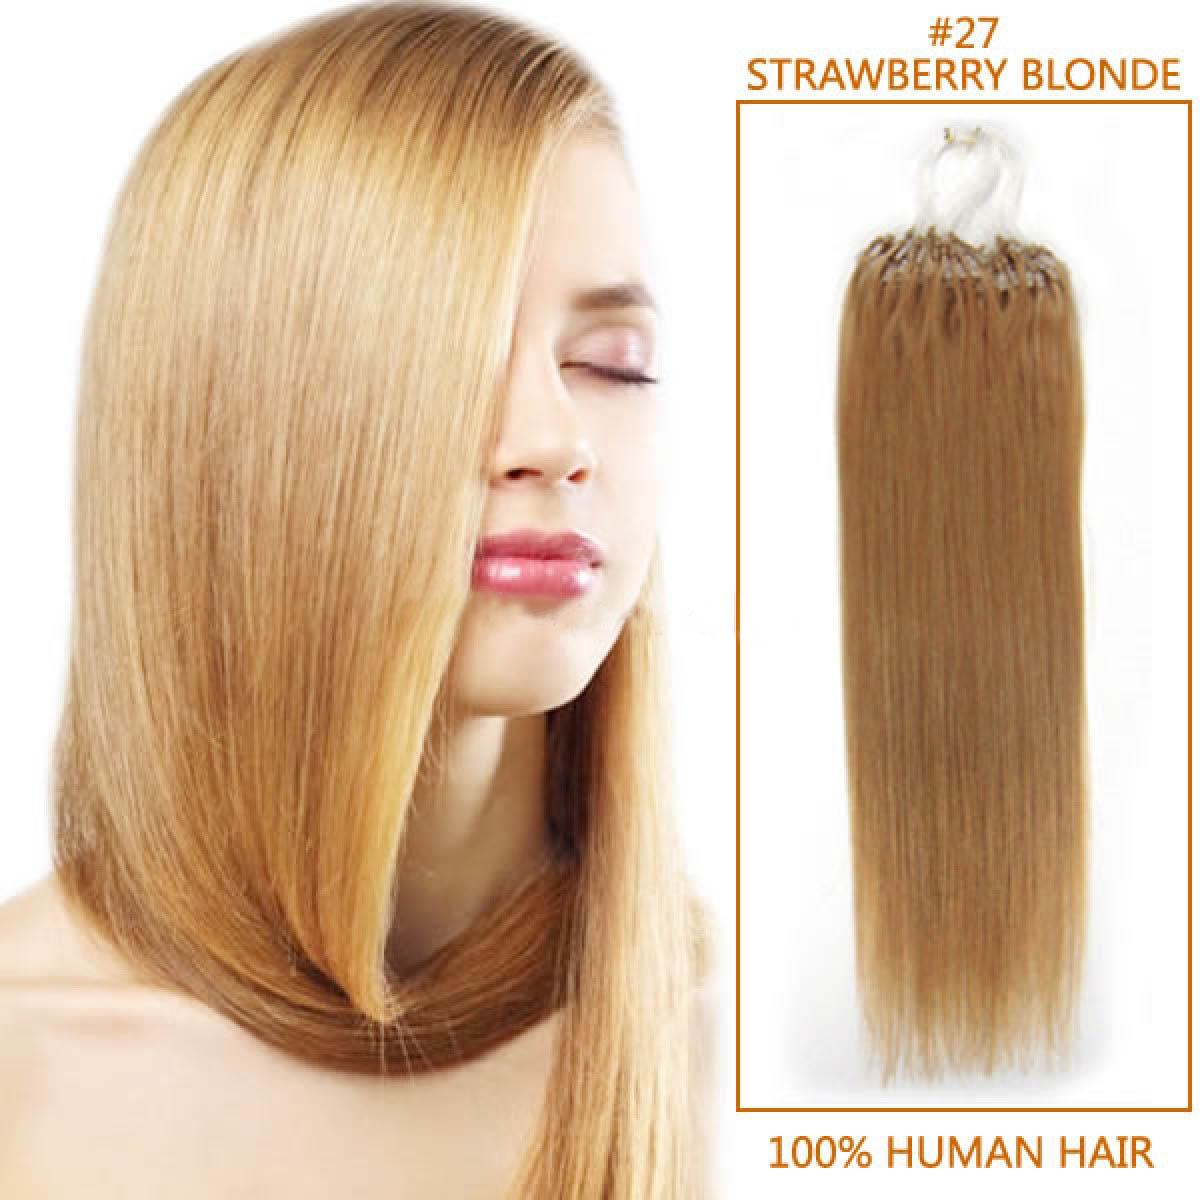 Inch 27 strawberry blonde micro loop human hair extensions 100s 26 inch 27 strawberry blonde micro loop human hair extensions 100s pmusecretfo Images